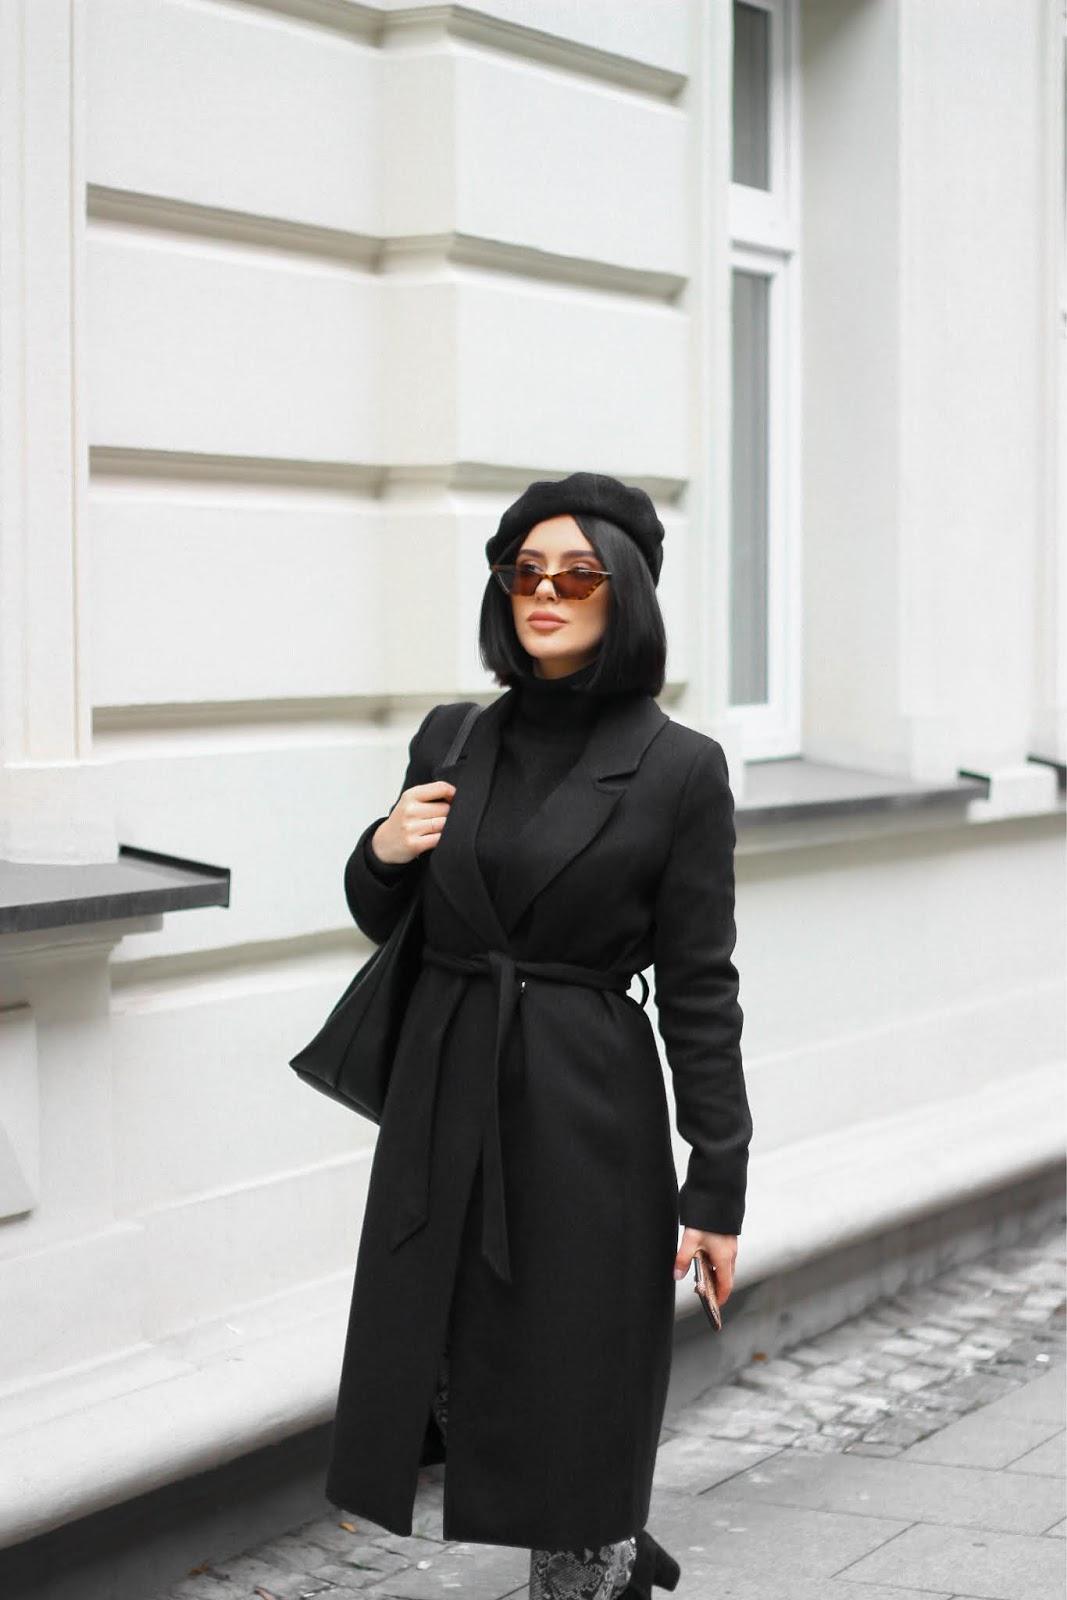 jak nosić beret, beret, czarny beret, beret stylizacja, modne nakrycia głowy